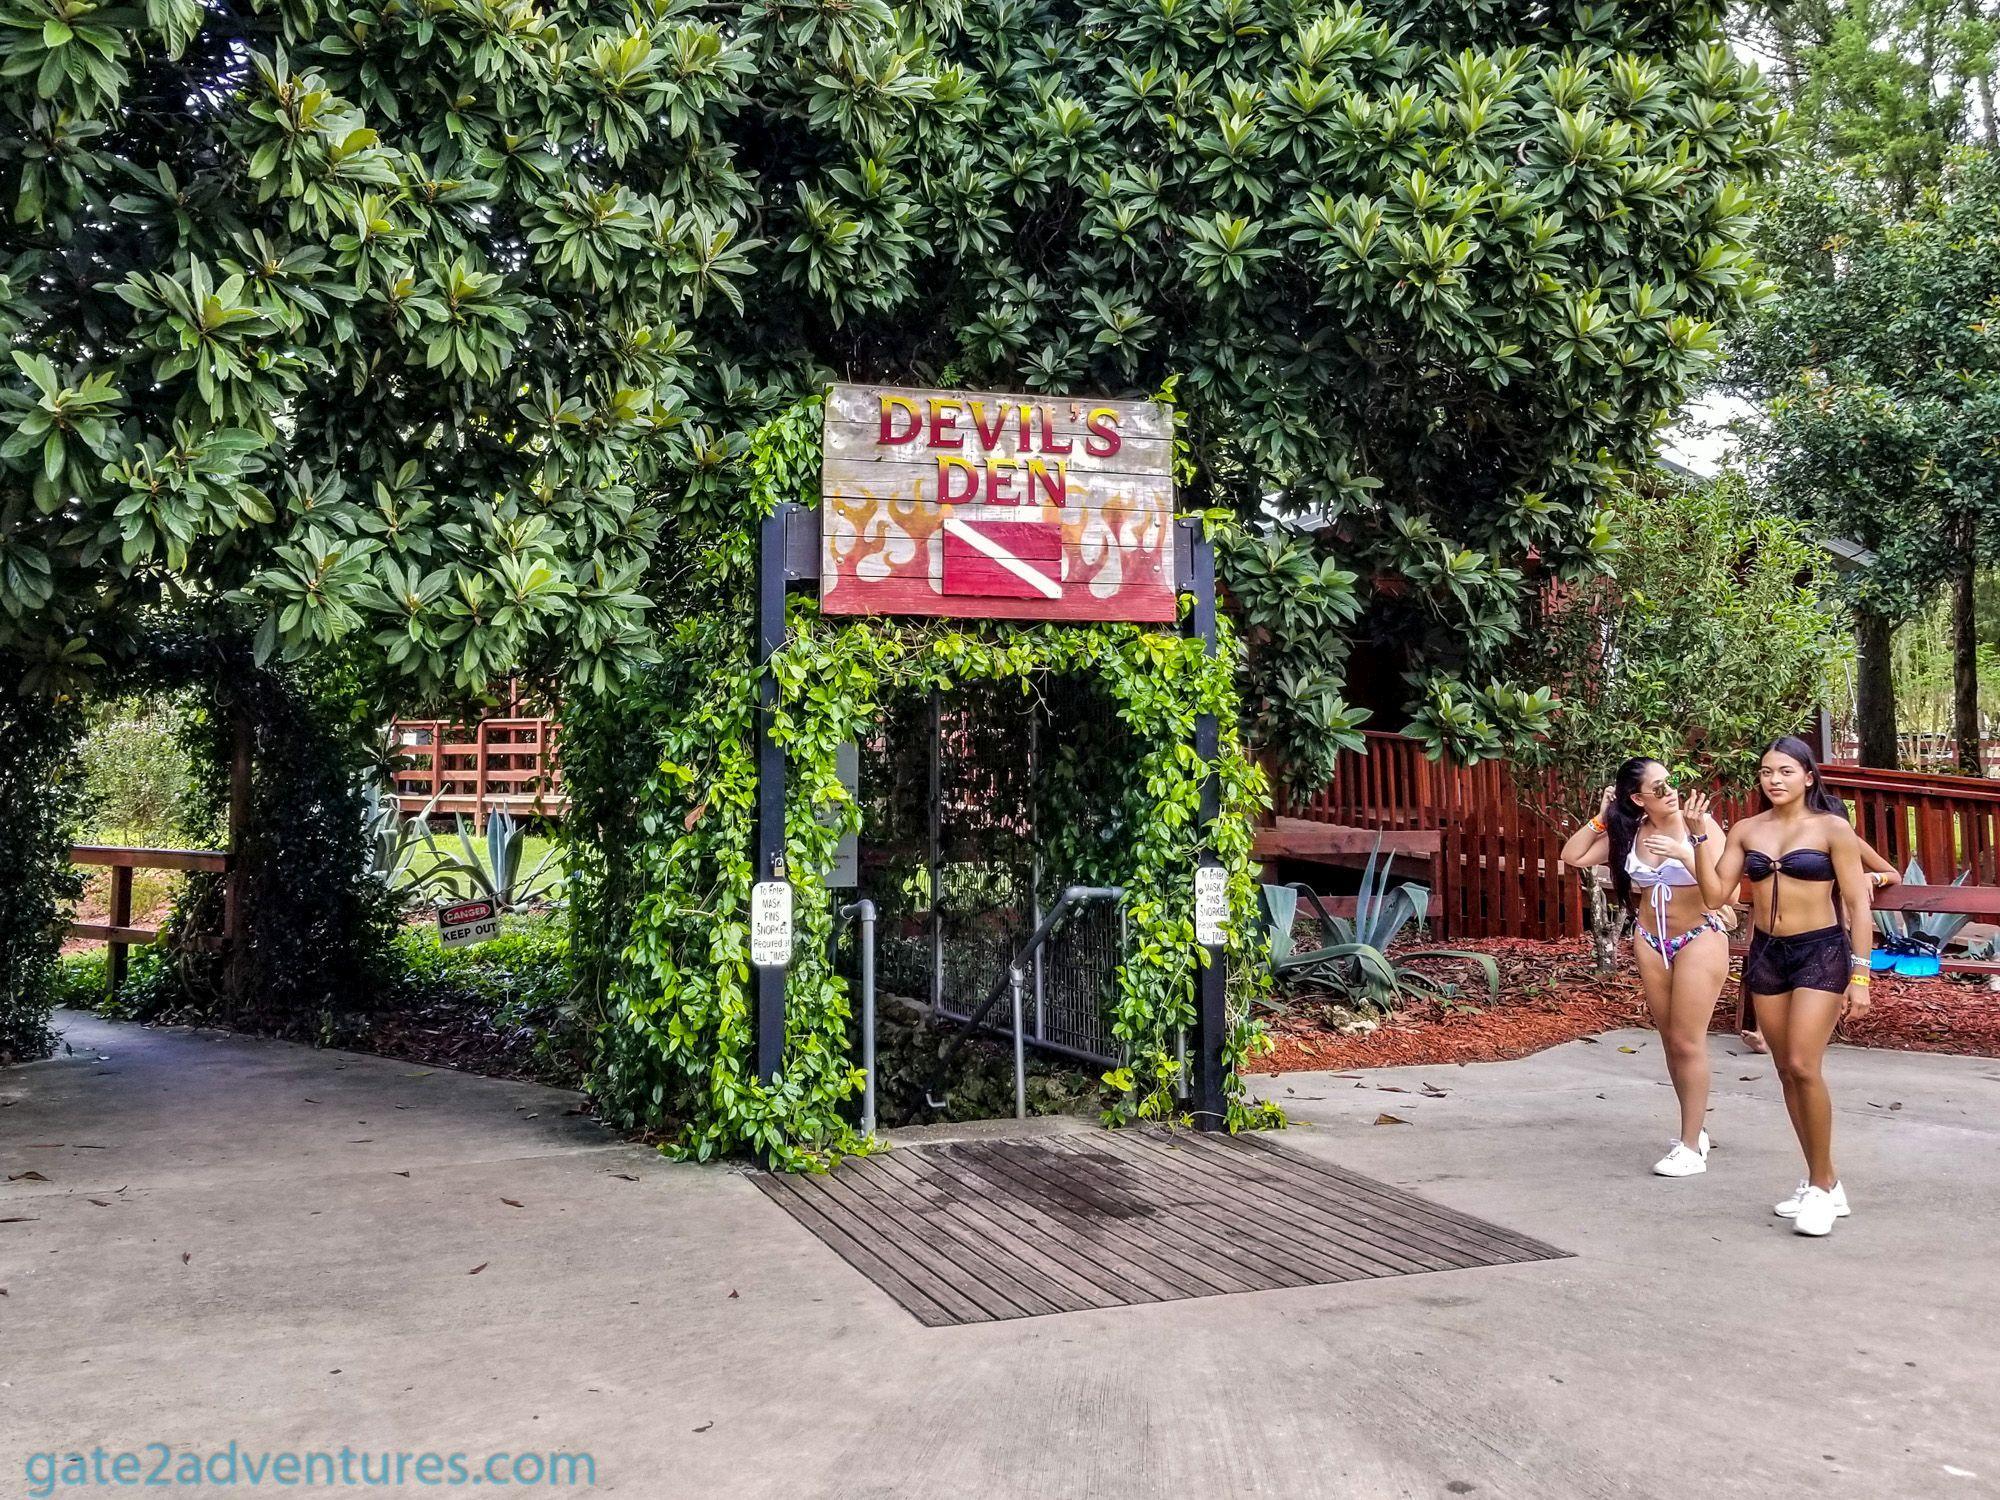 Devil's Den: A Prehistoric Diving Experience in Florida